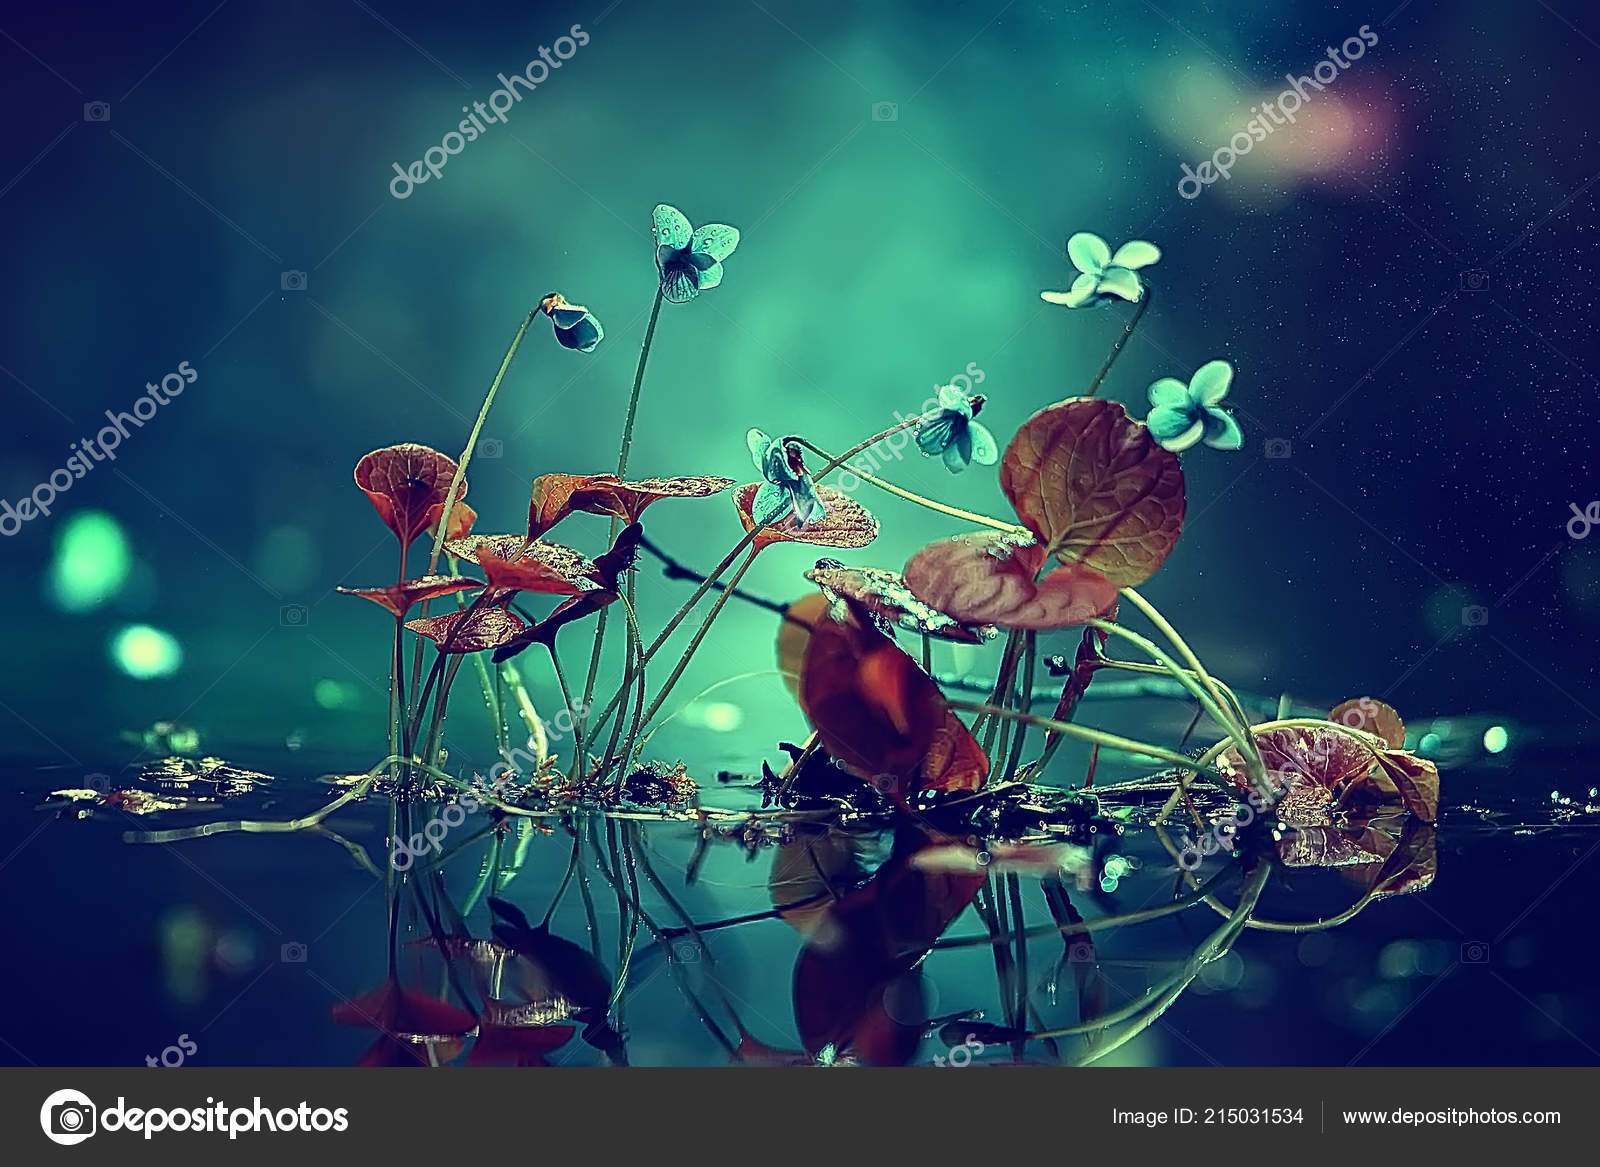 Nature Beauty Flowers Background Flowers Vintage Toning Beautiful Nature Photo Stock Photo Image By C Xload 215031534